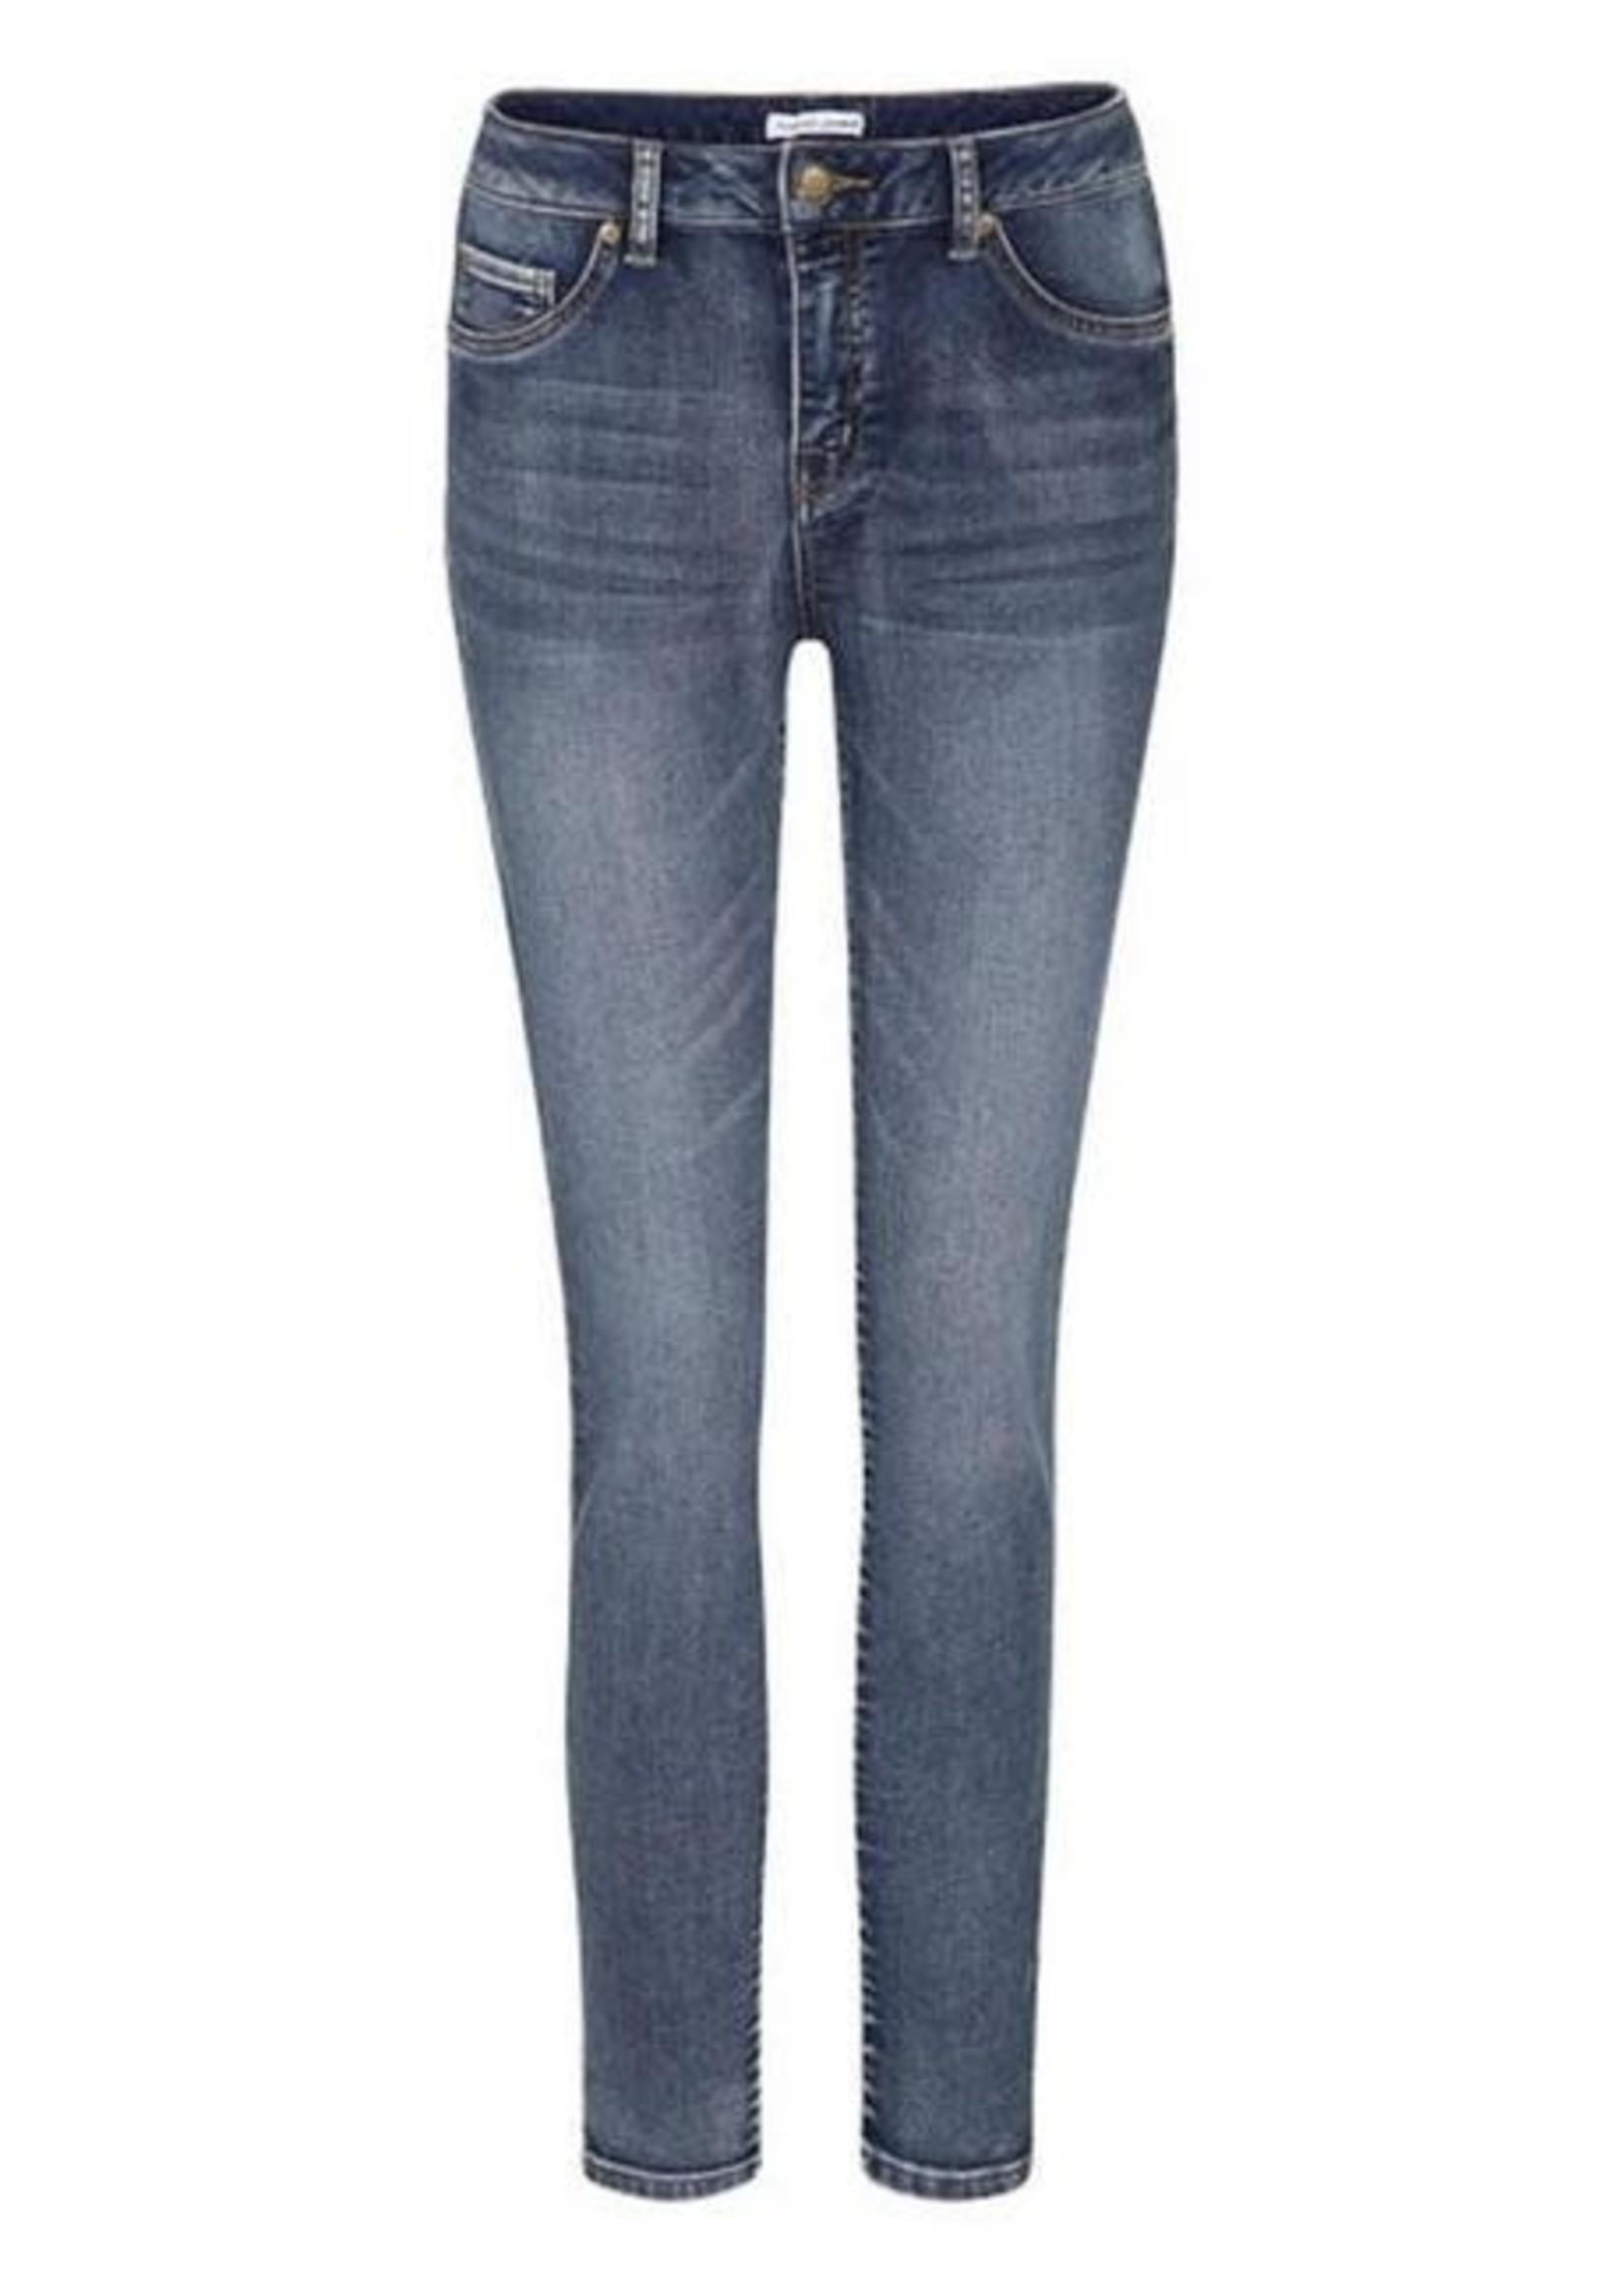 Tribal Tribal Skinny Knit Jeans